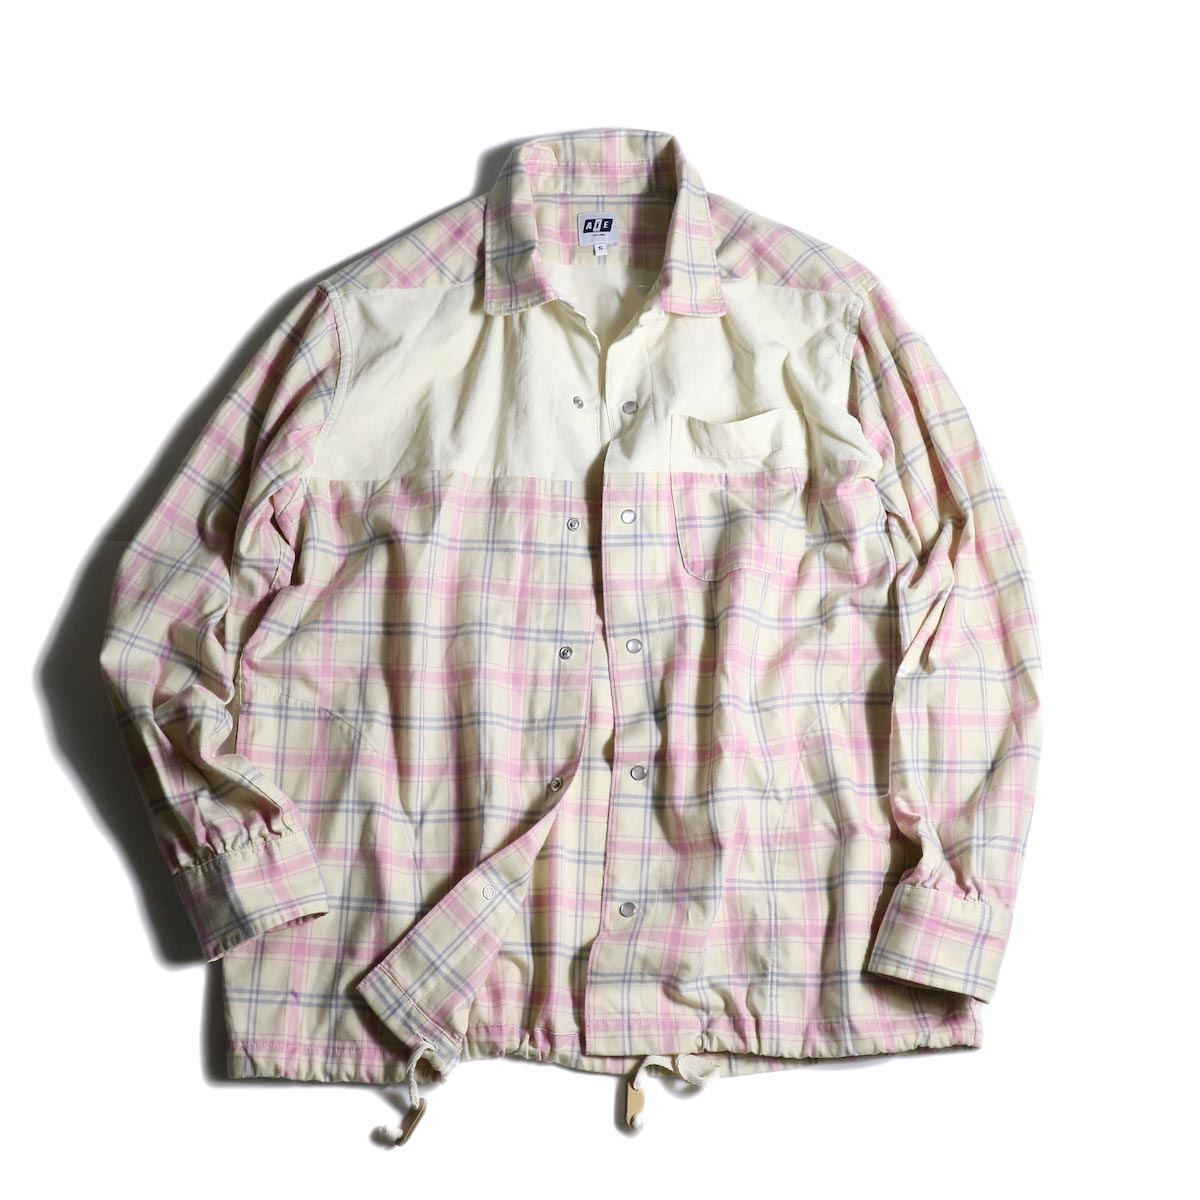 AiE / Coach Shirt -Cotton Plaid 正面